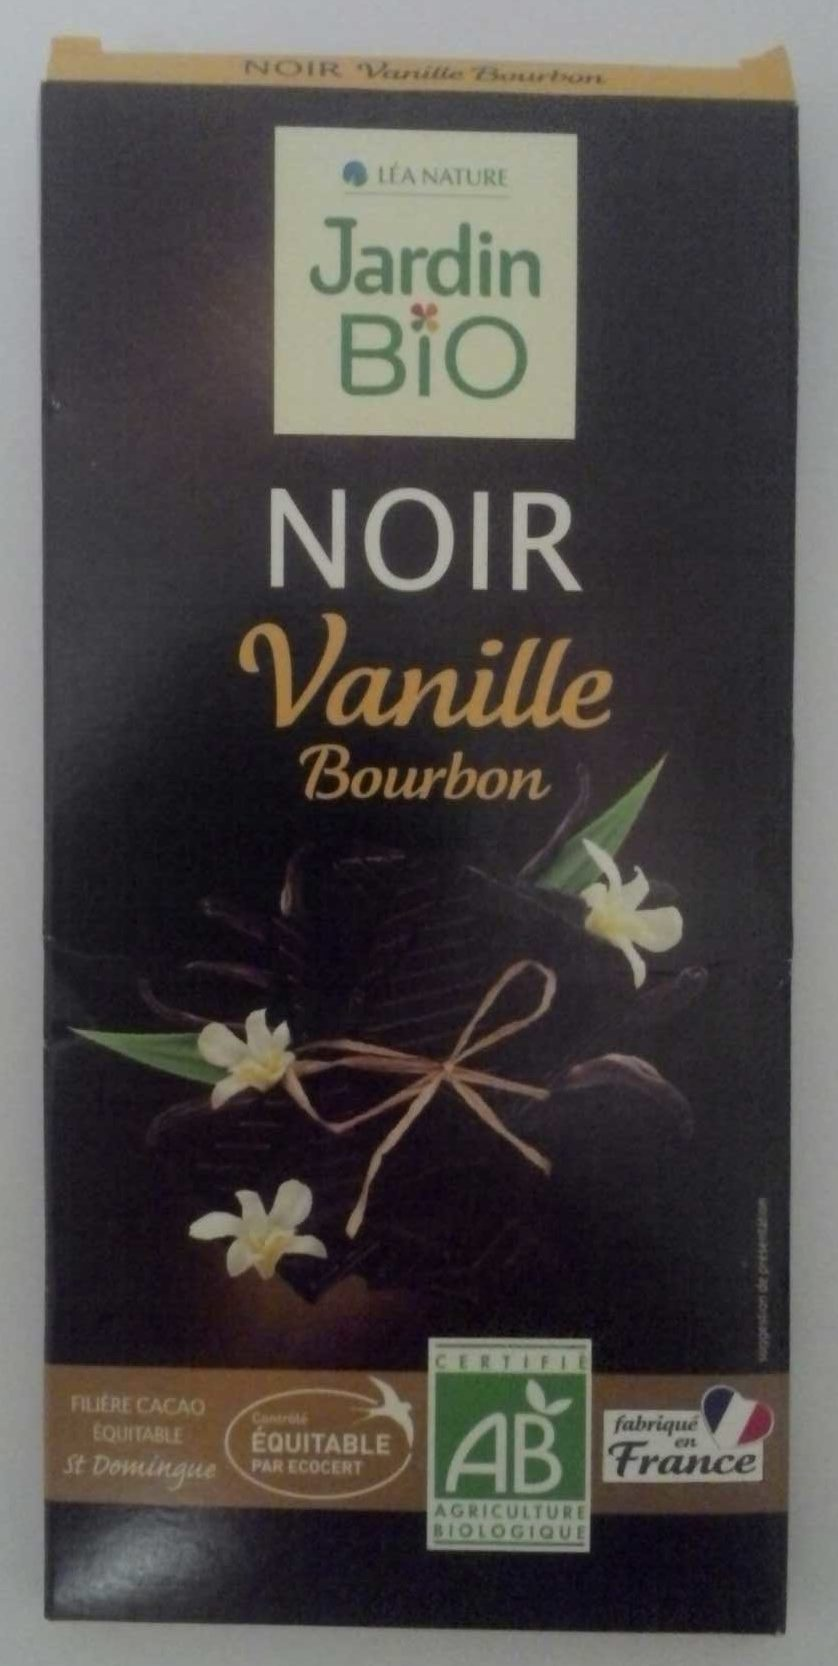 Chocolat Noir Vanille Bourbon - Product